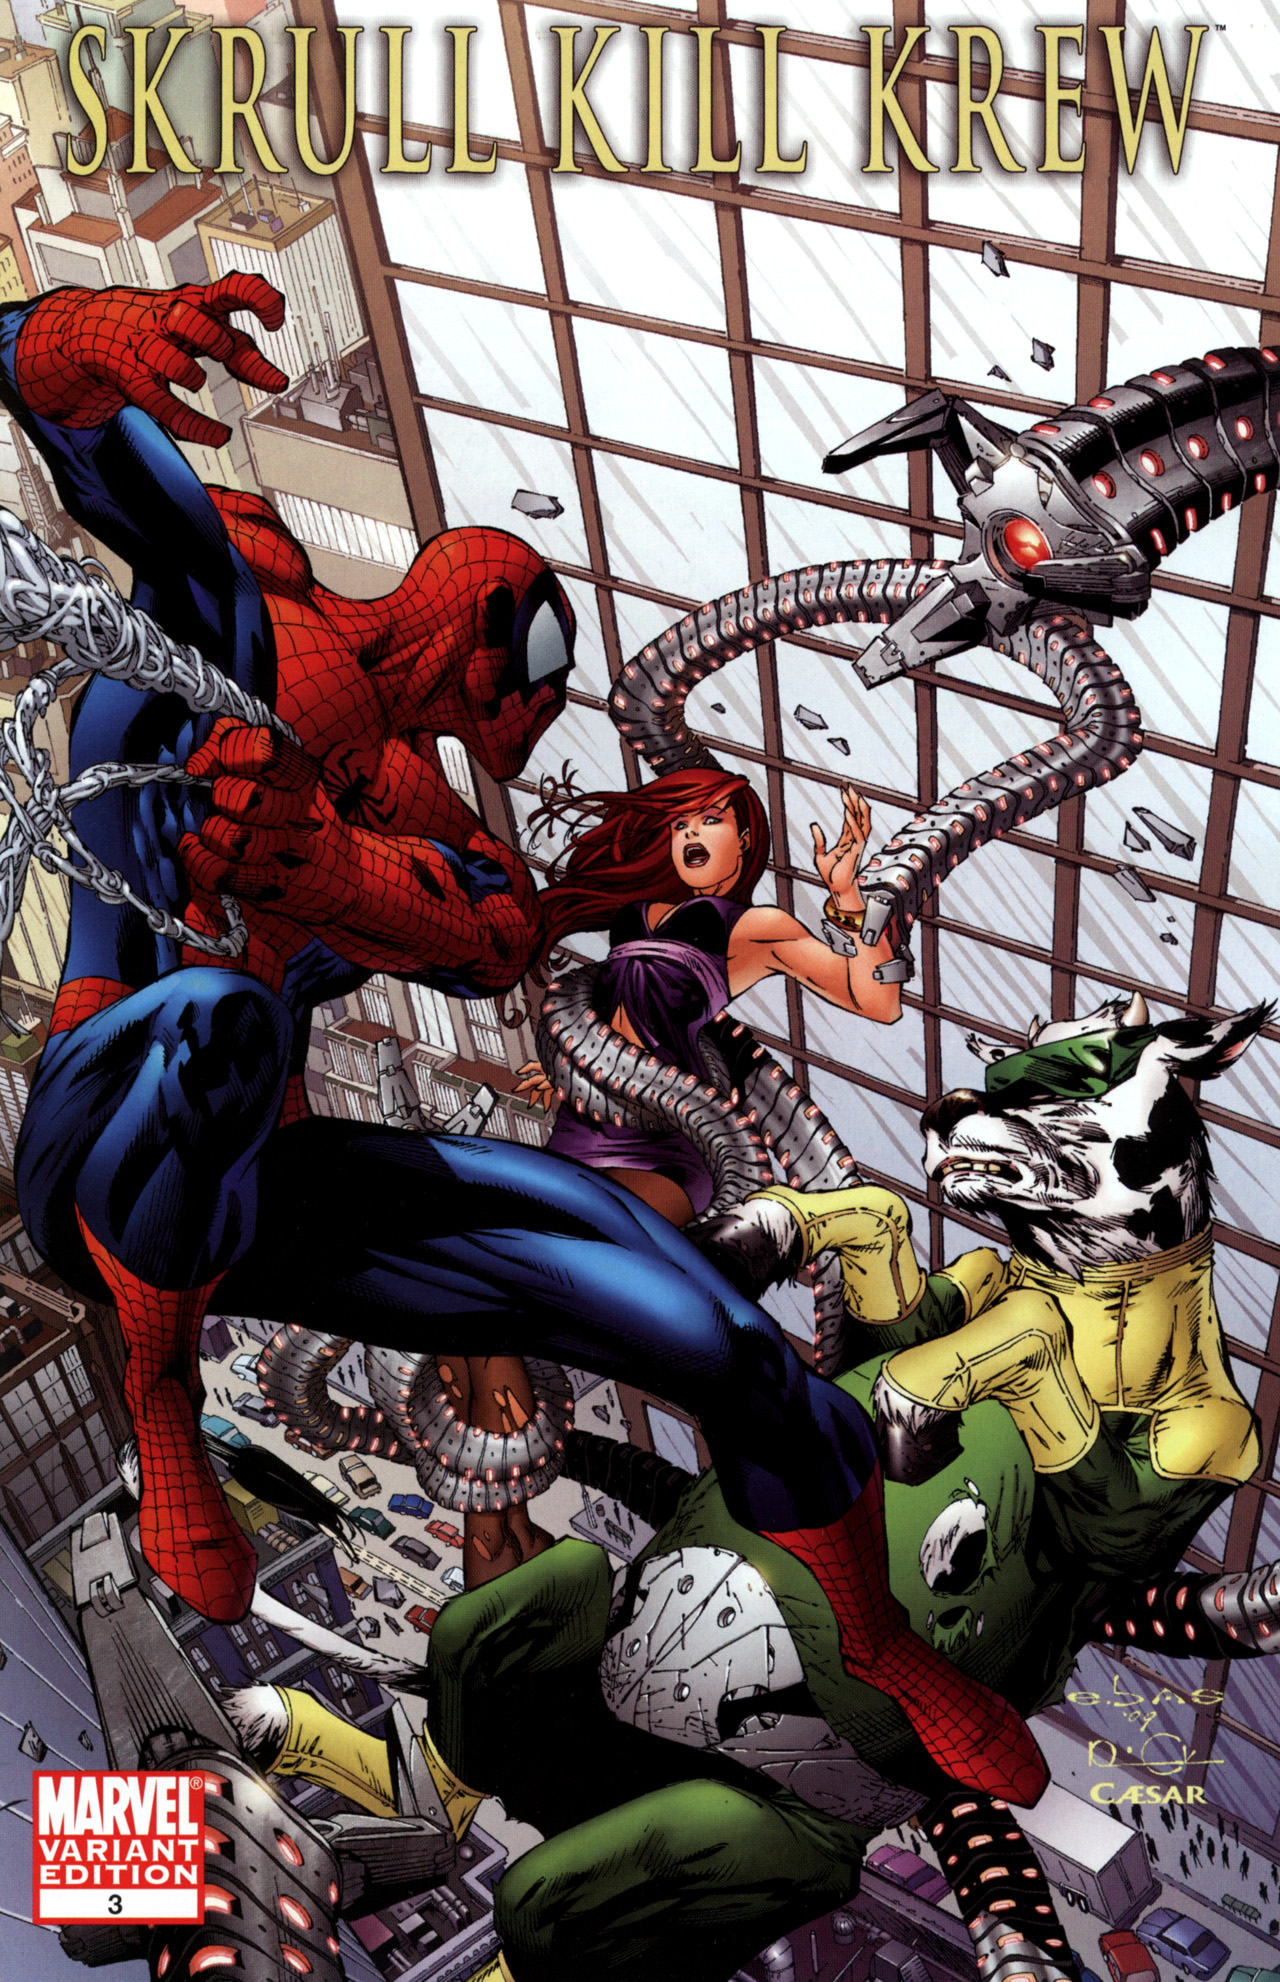 Read online Skrull Kill Krew (2009) comic -  Issue #3 - 2